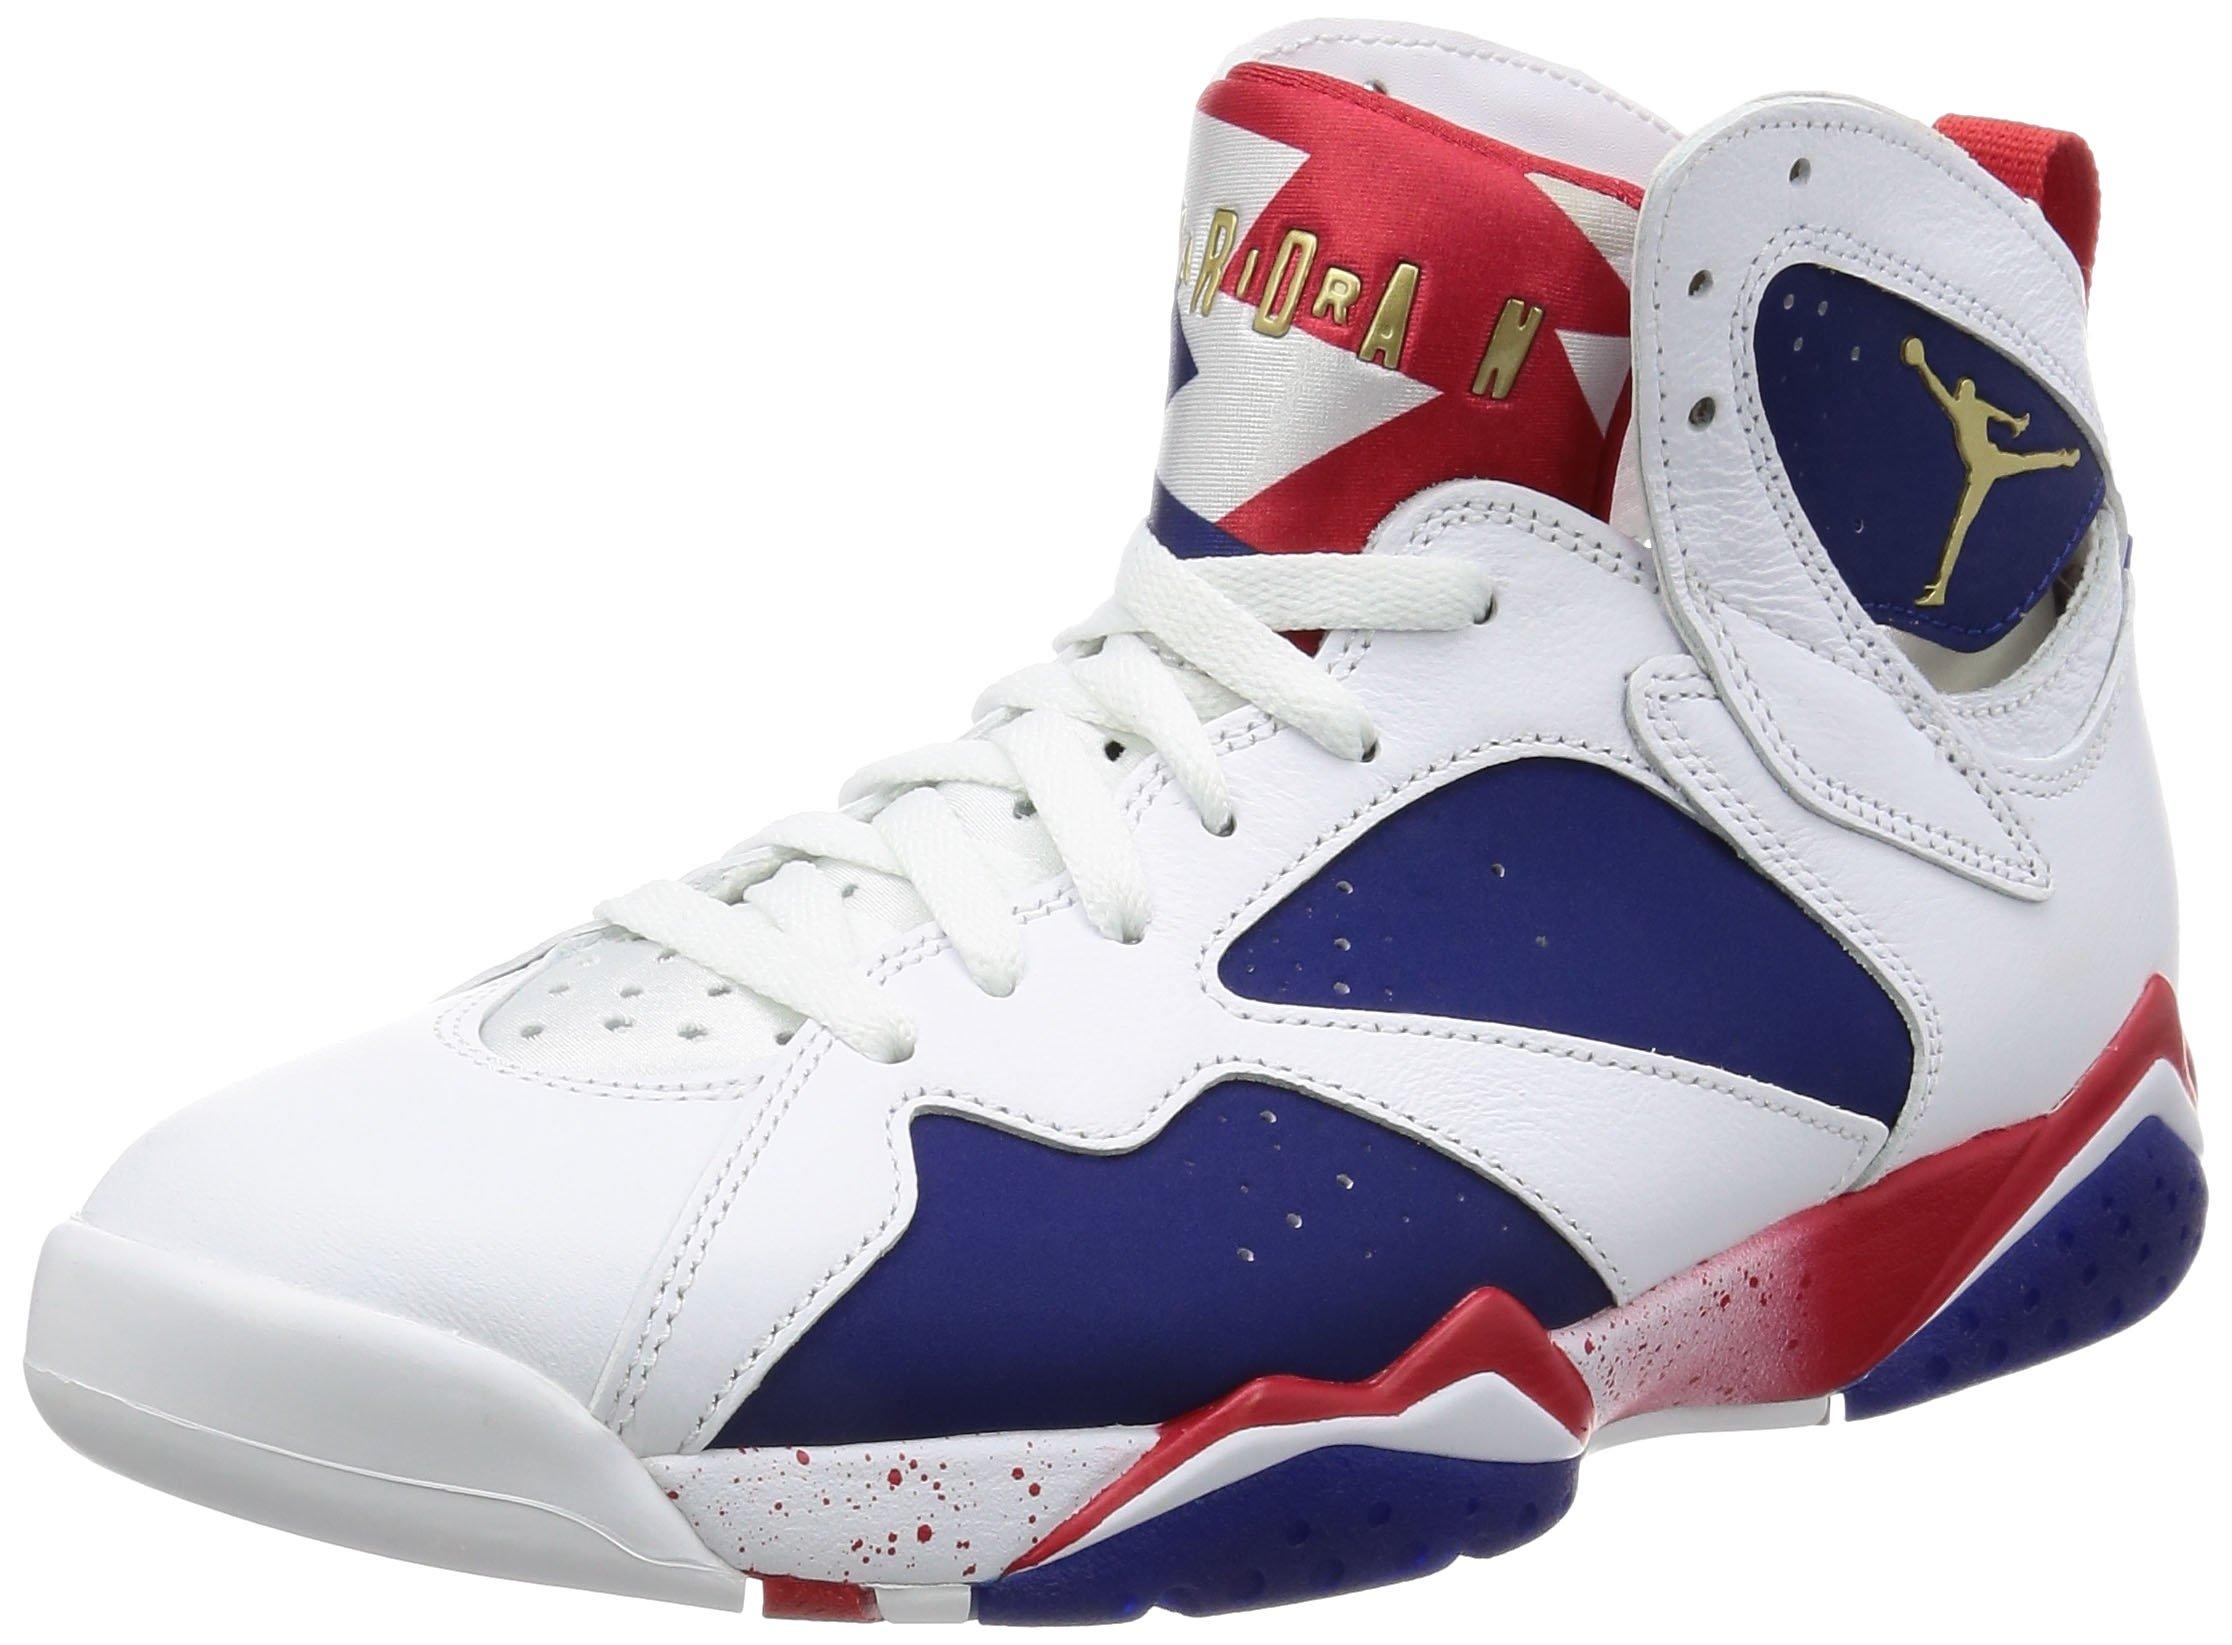 Nike Jordan Men's Air Jordan 7 Retro White/Mtlc Gld Cn Dp Ryl Bl Fr Basketball Shoe 9.5 Men US by Jordan